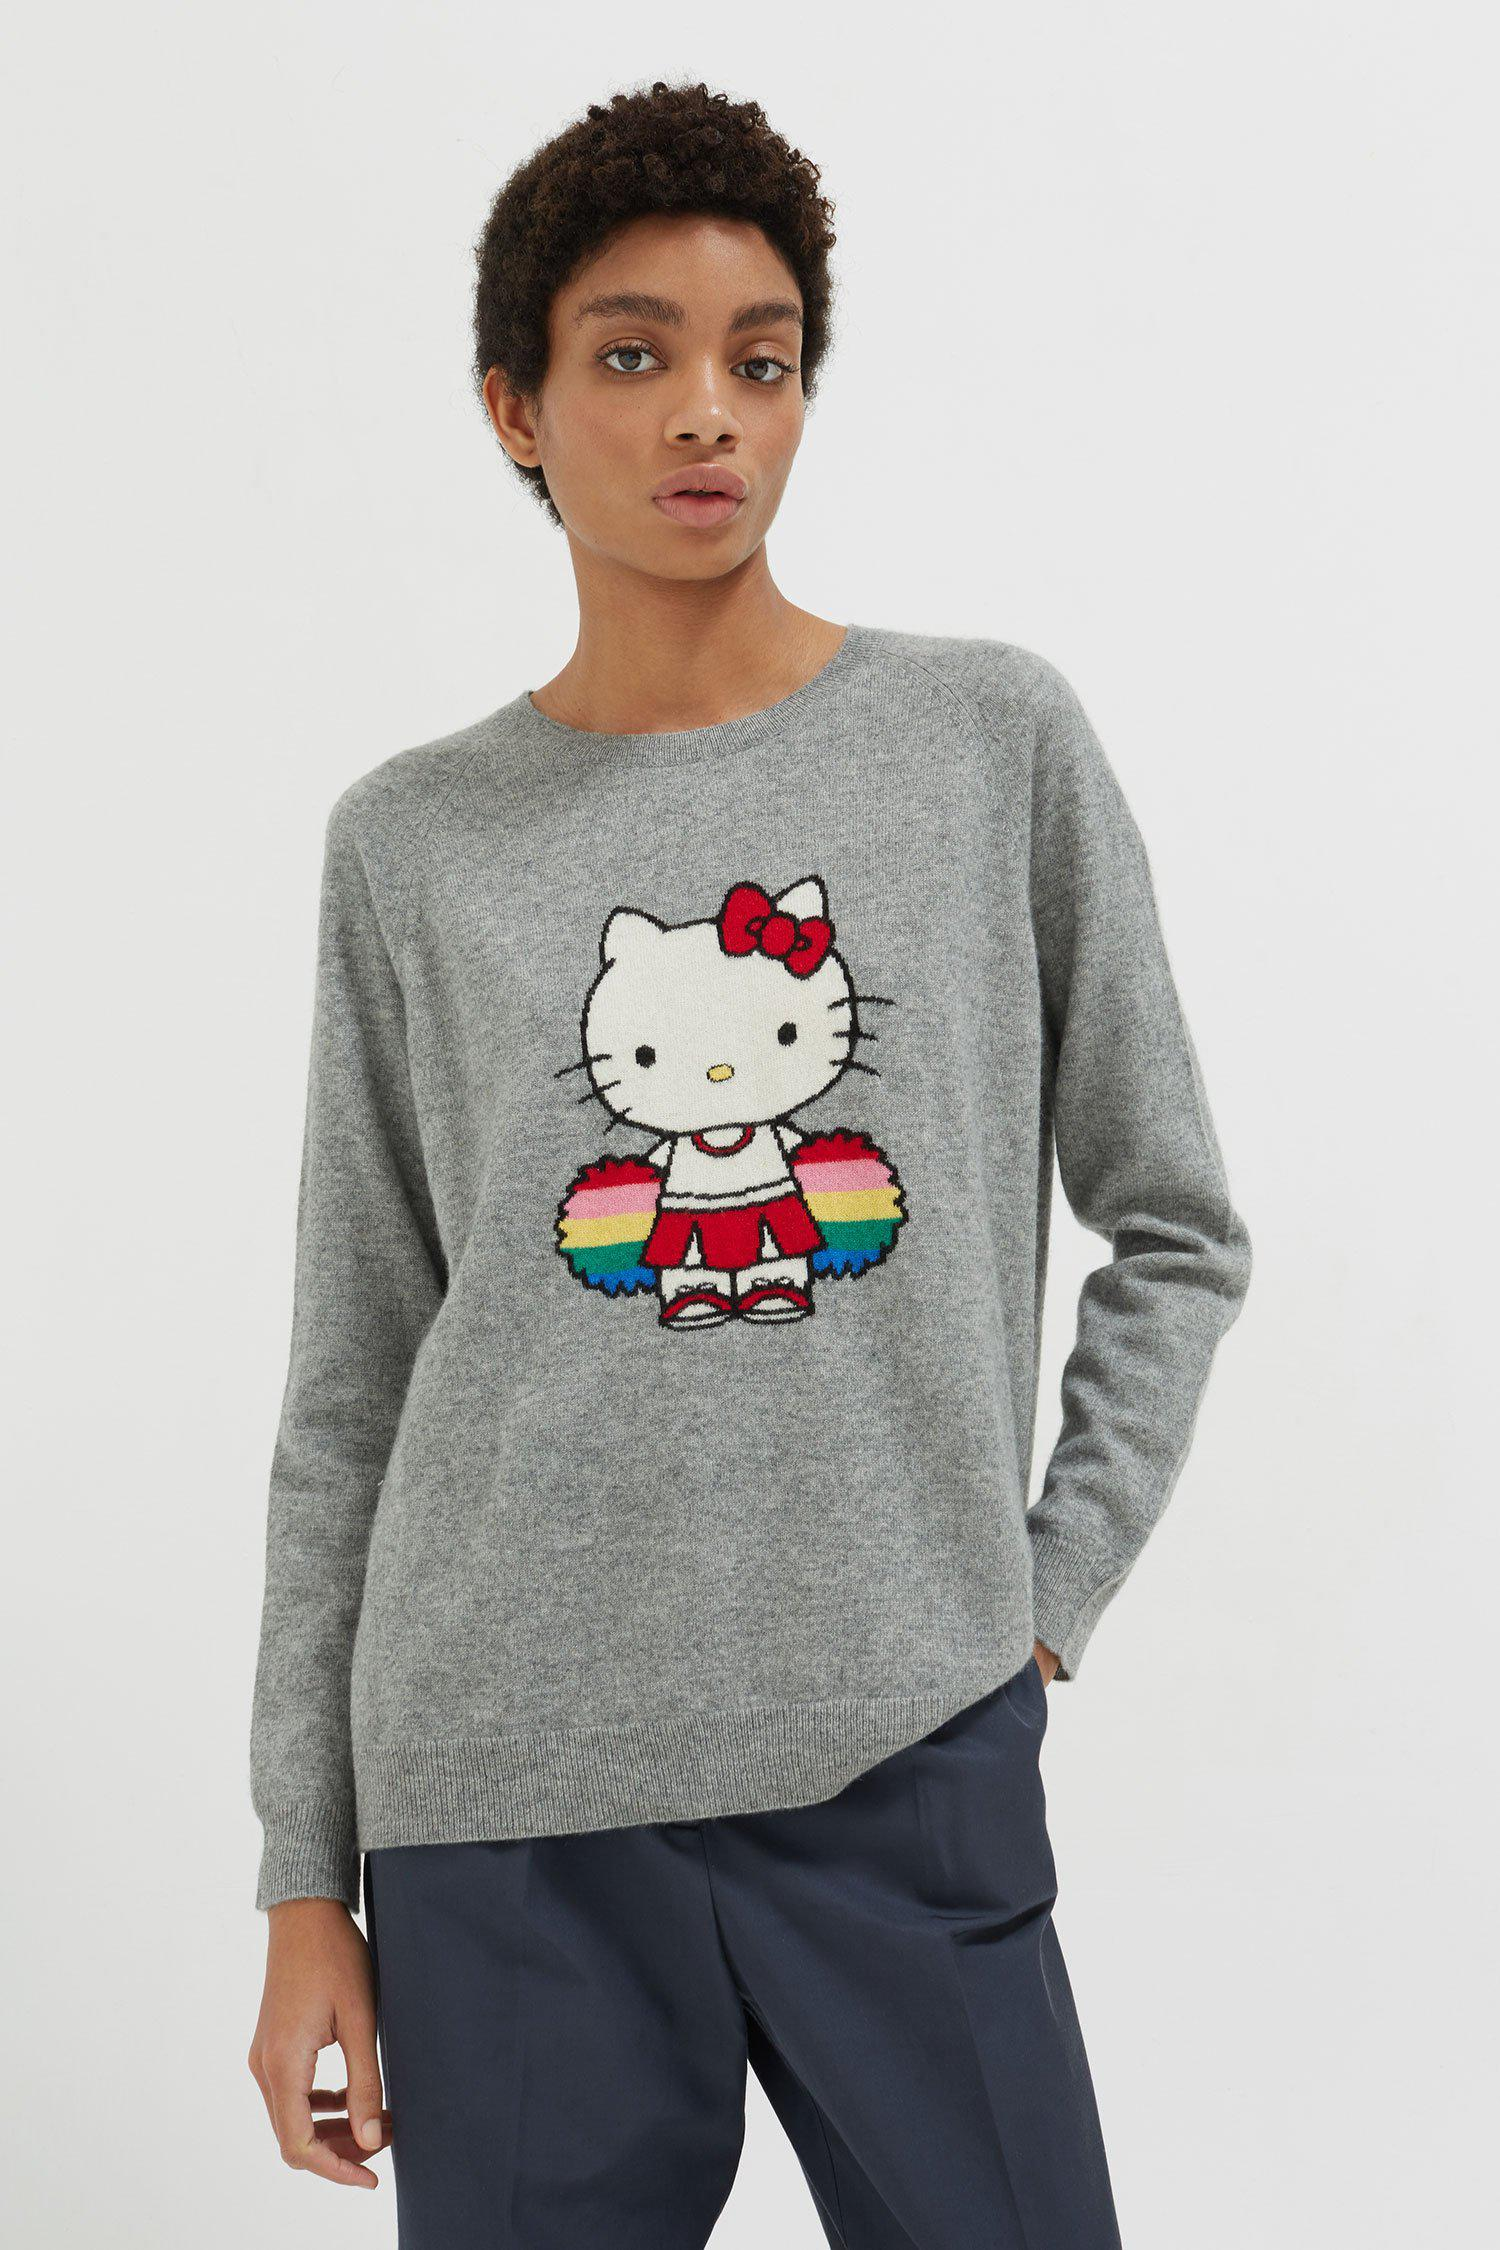 amp; Parker Hello Grey Gray Sweater Chinti Kitty Women's Cheerleader dSznqdW5